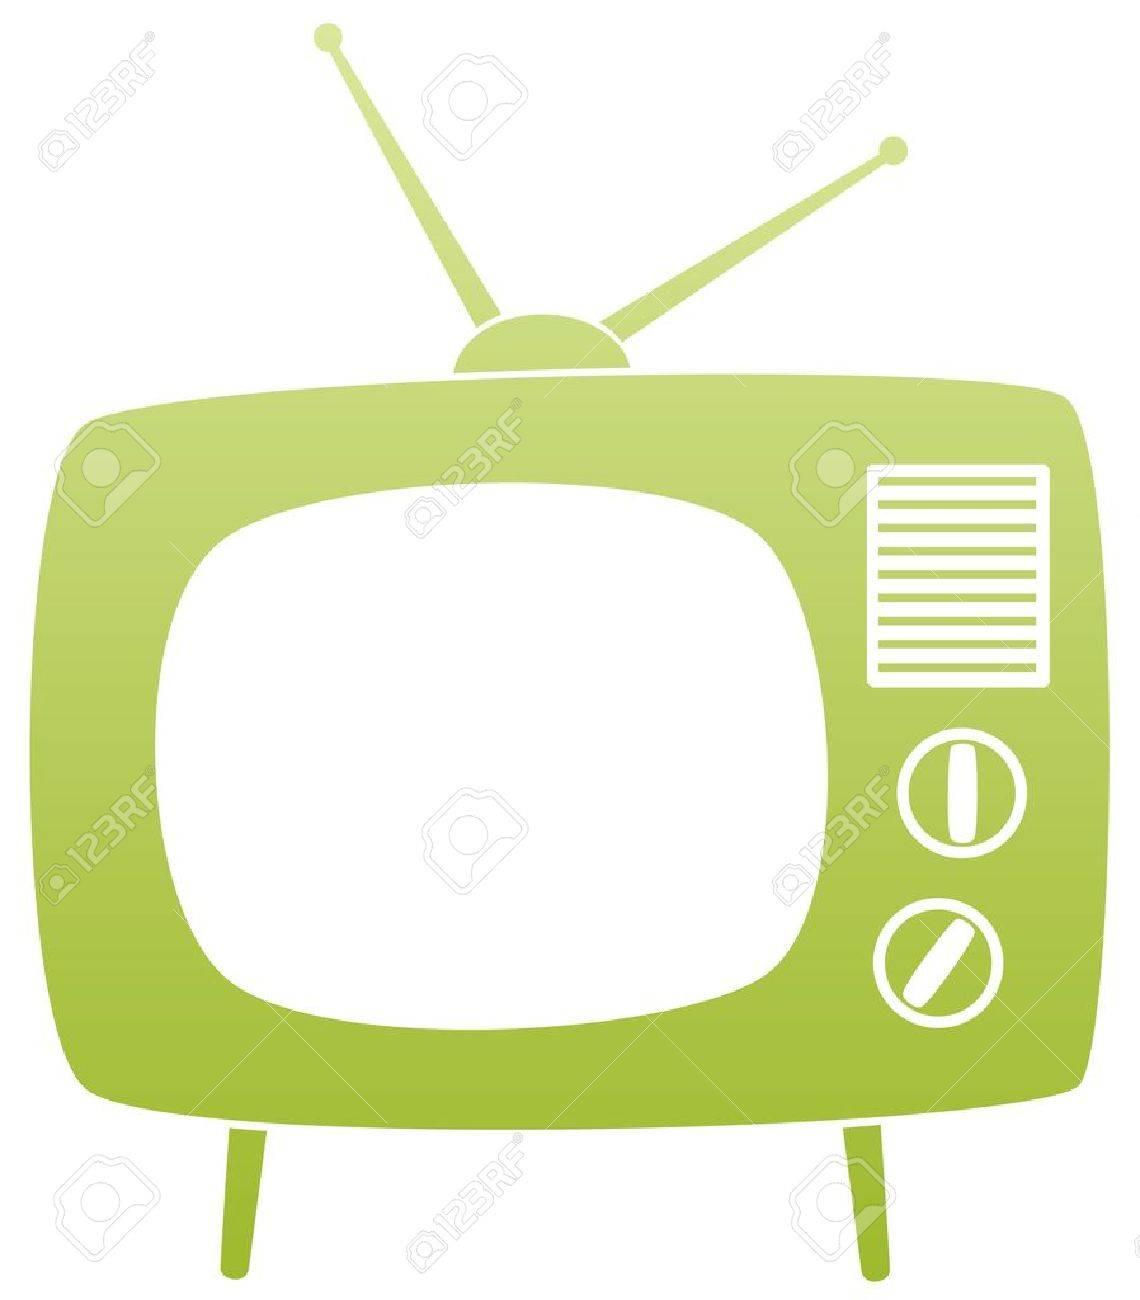 symbol of green retro tv set - 10190592